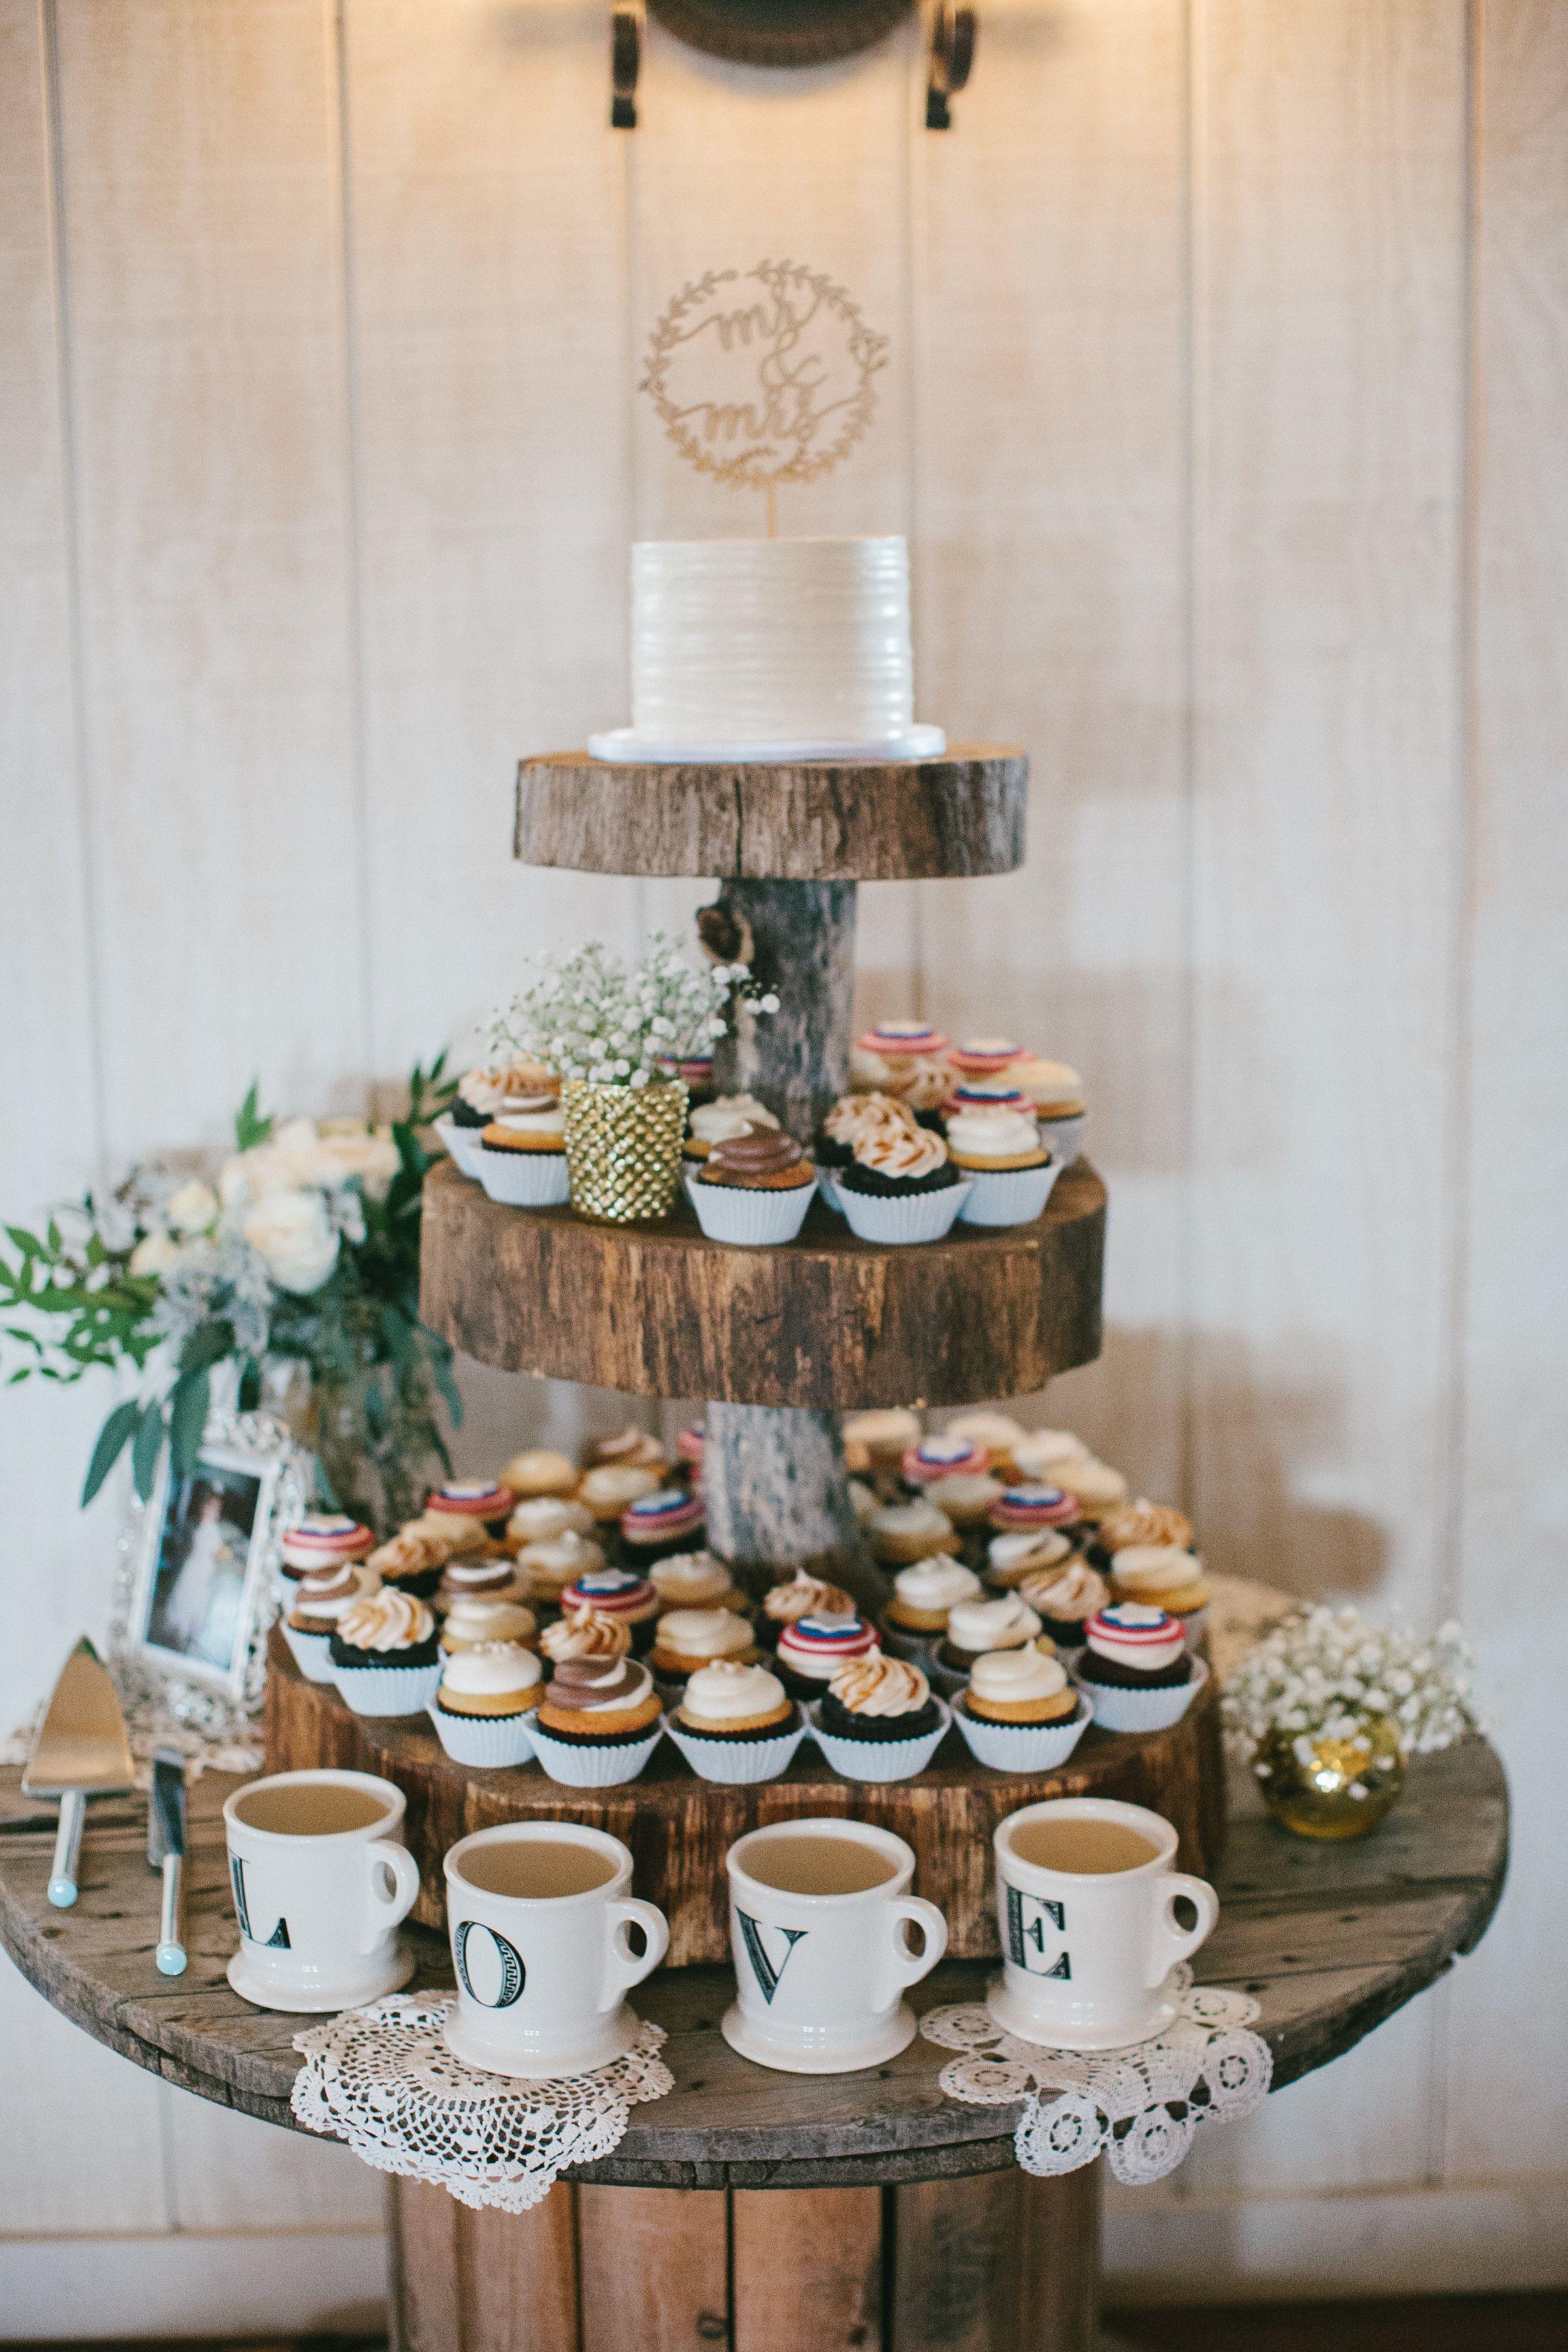 Rustic Wedding Cupcake Cake Table Dessert Table Cake Topper Barn